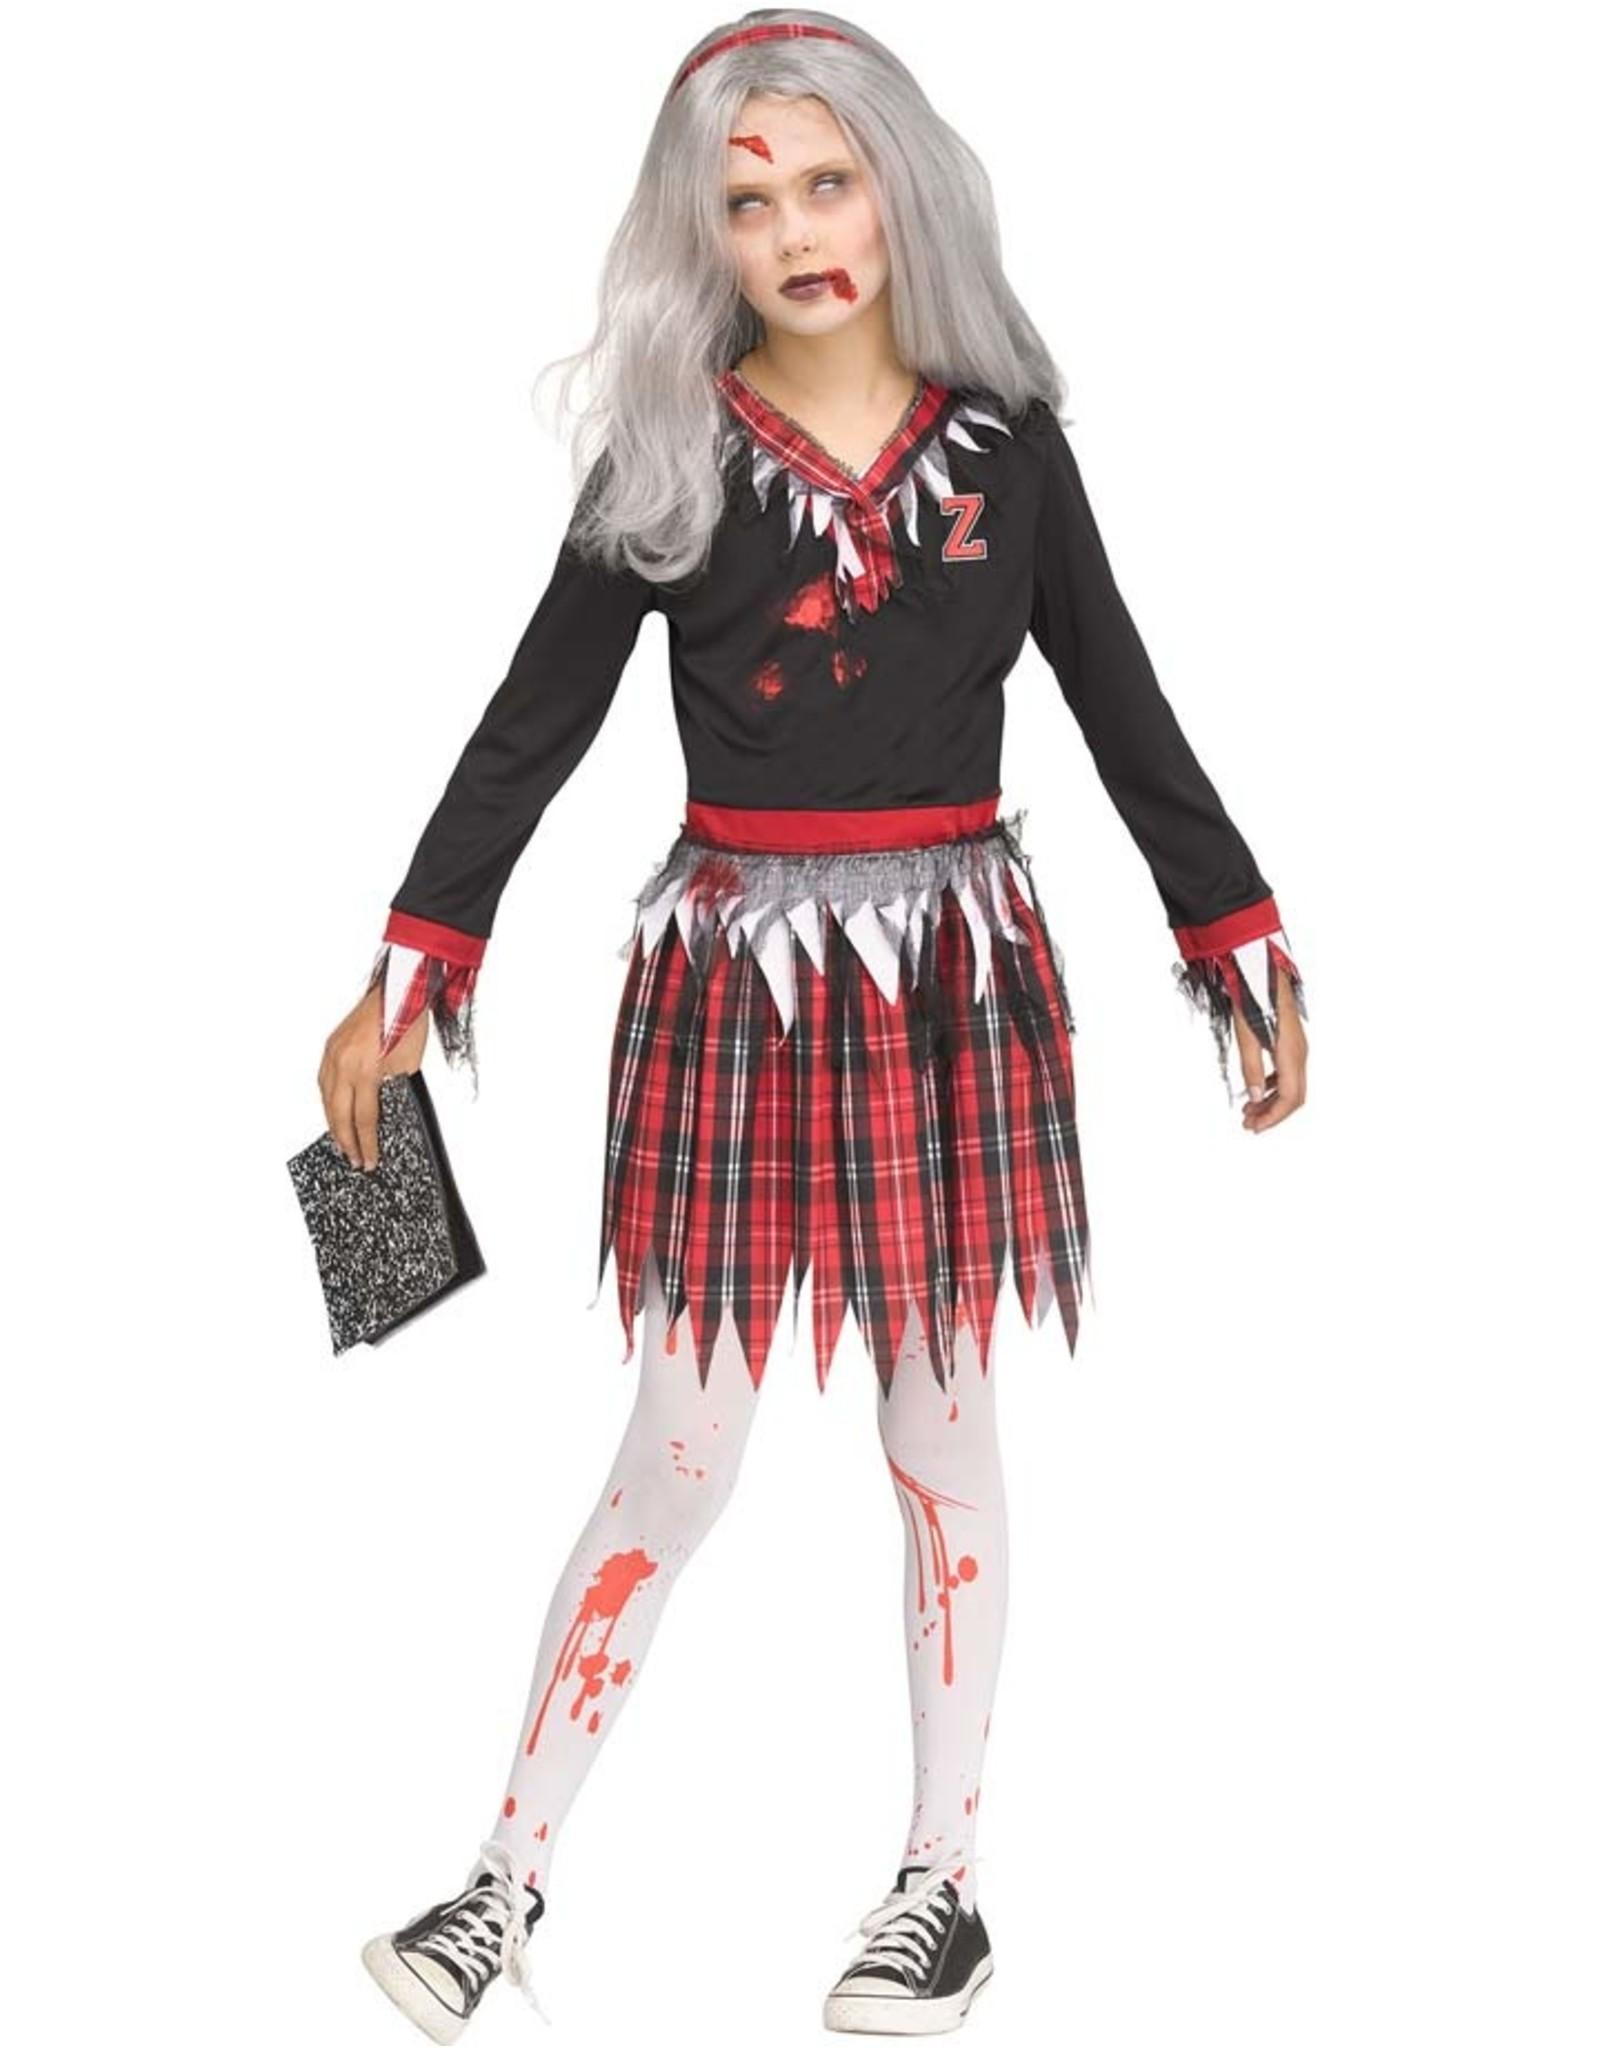 FUN WORLD Zombie School Girl - Girls